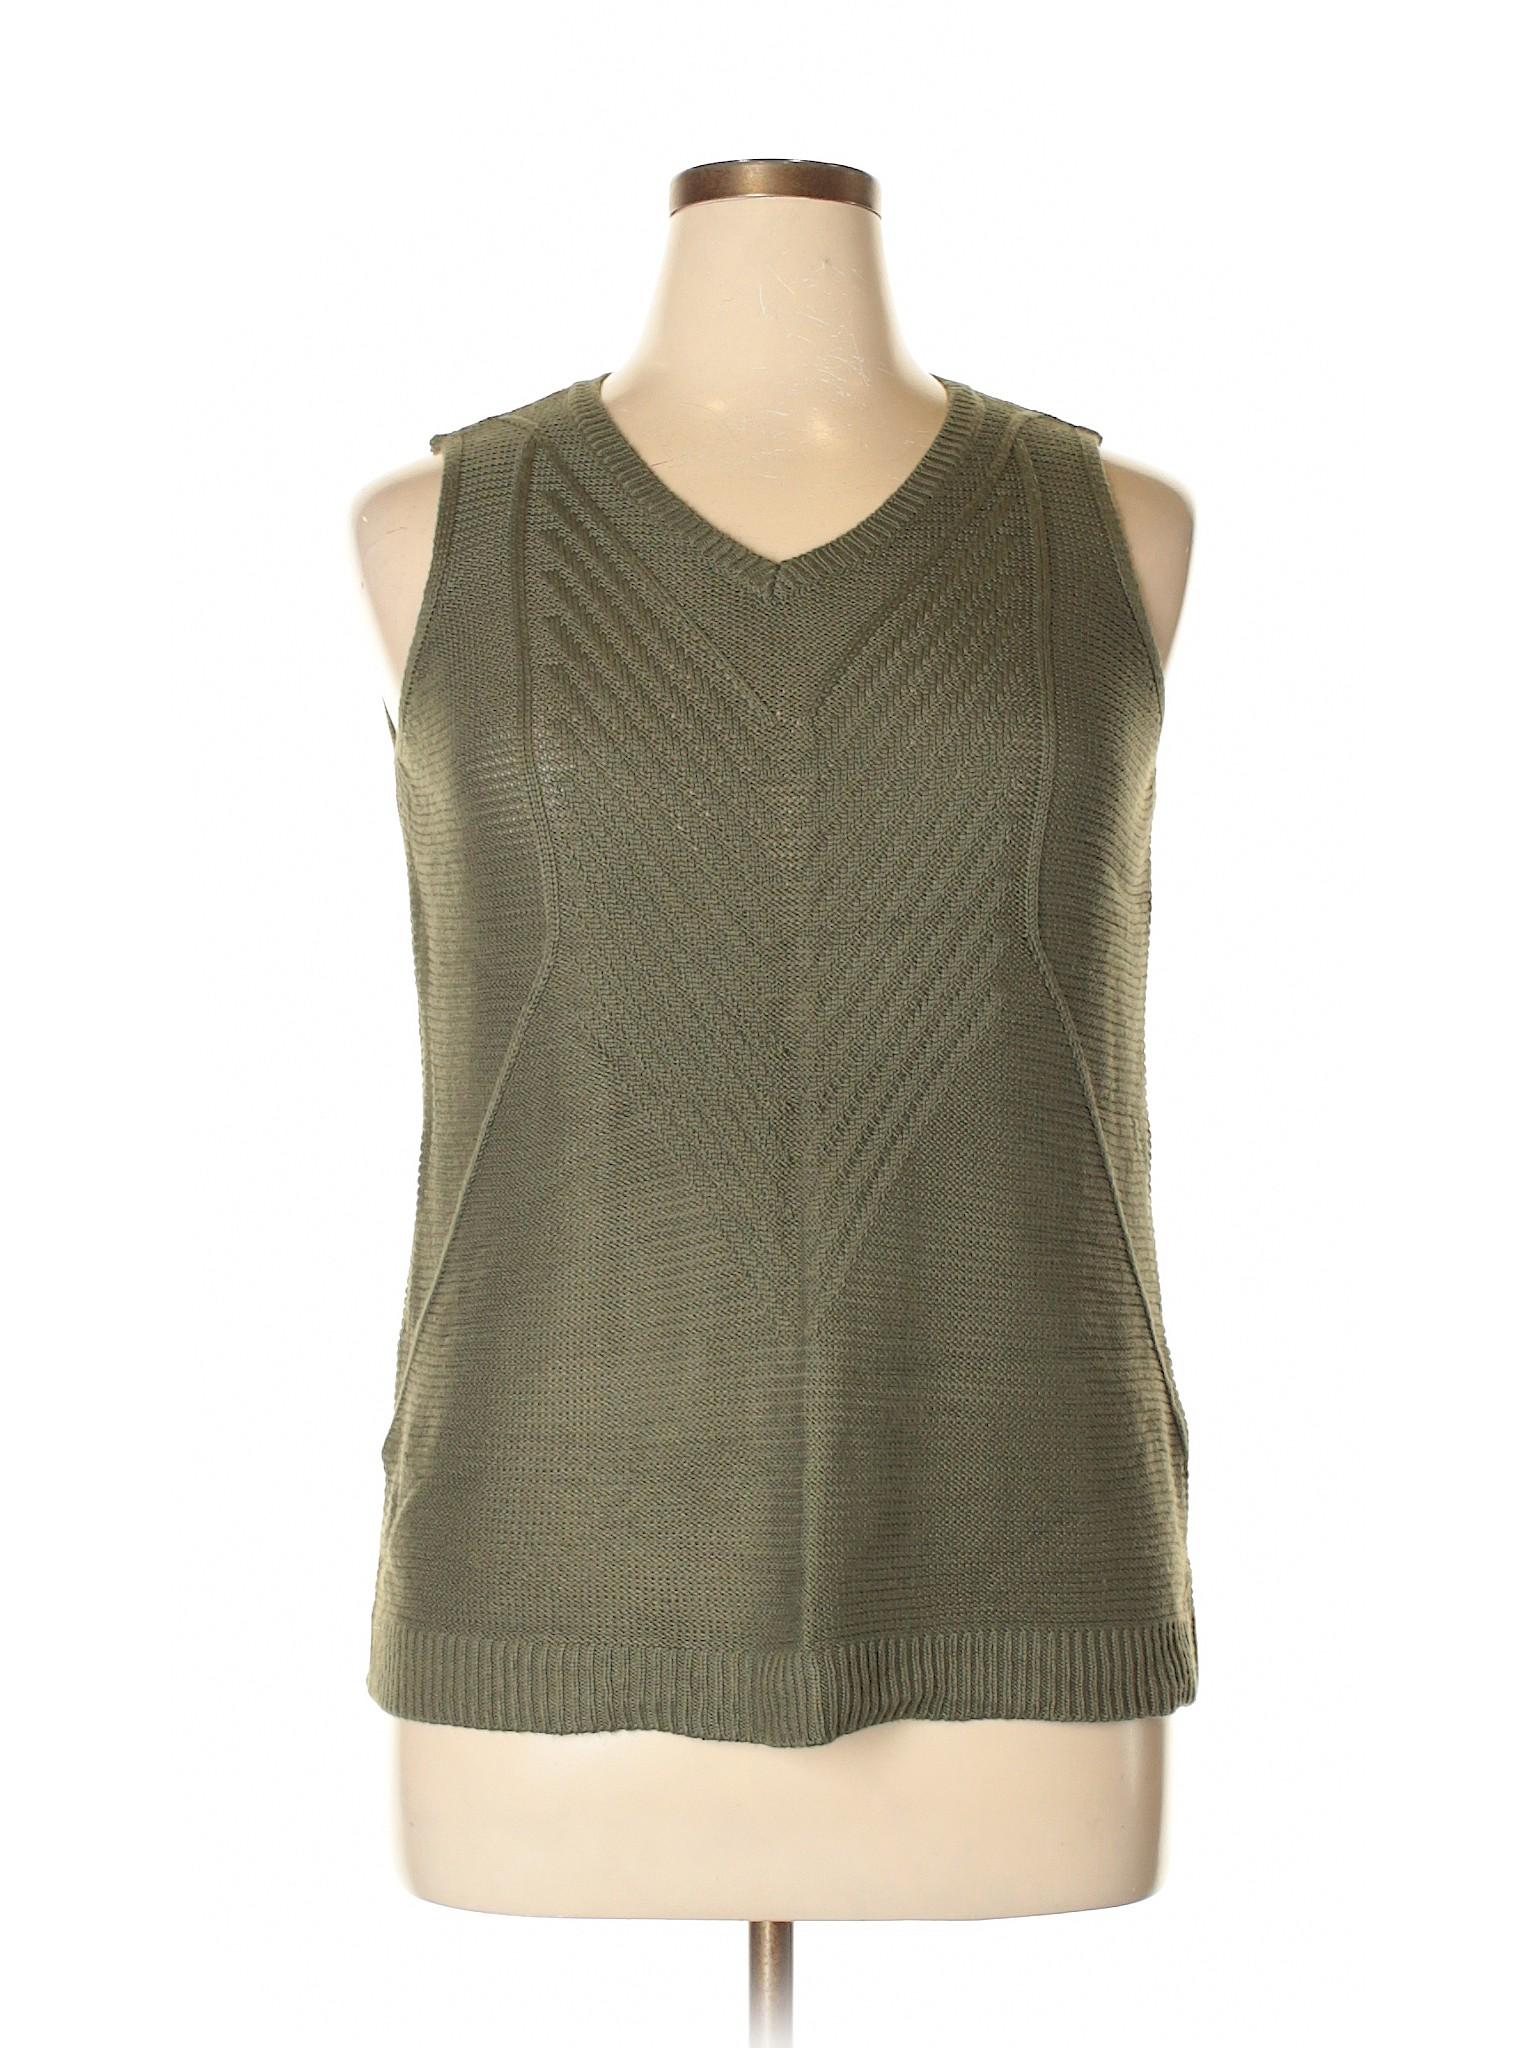 Chico's Boutique Boutique Chico's Sweater Pullover qpvB6wS